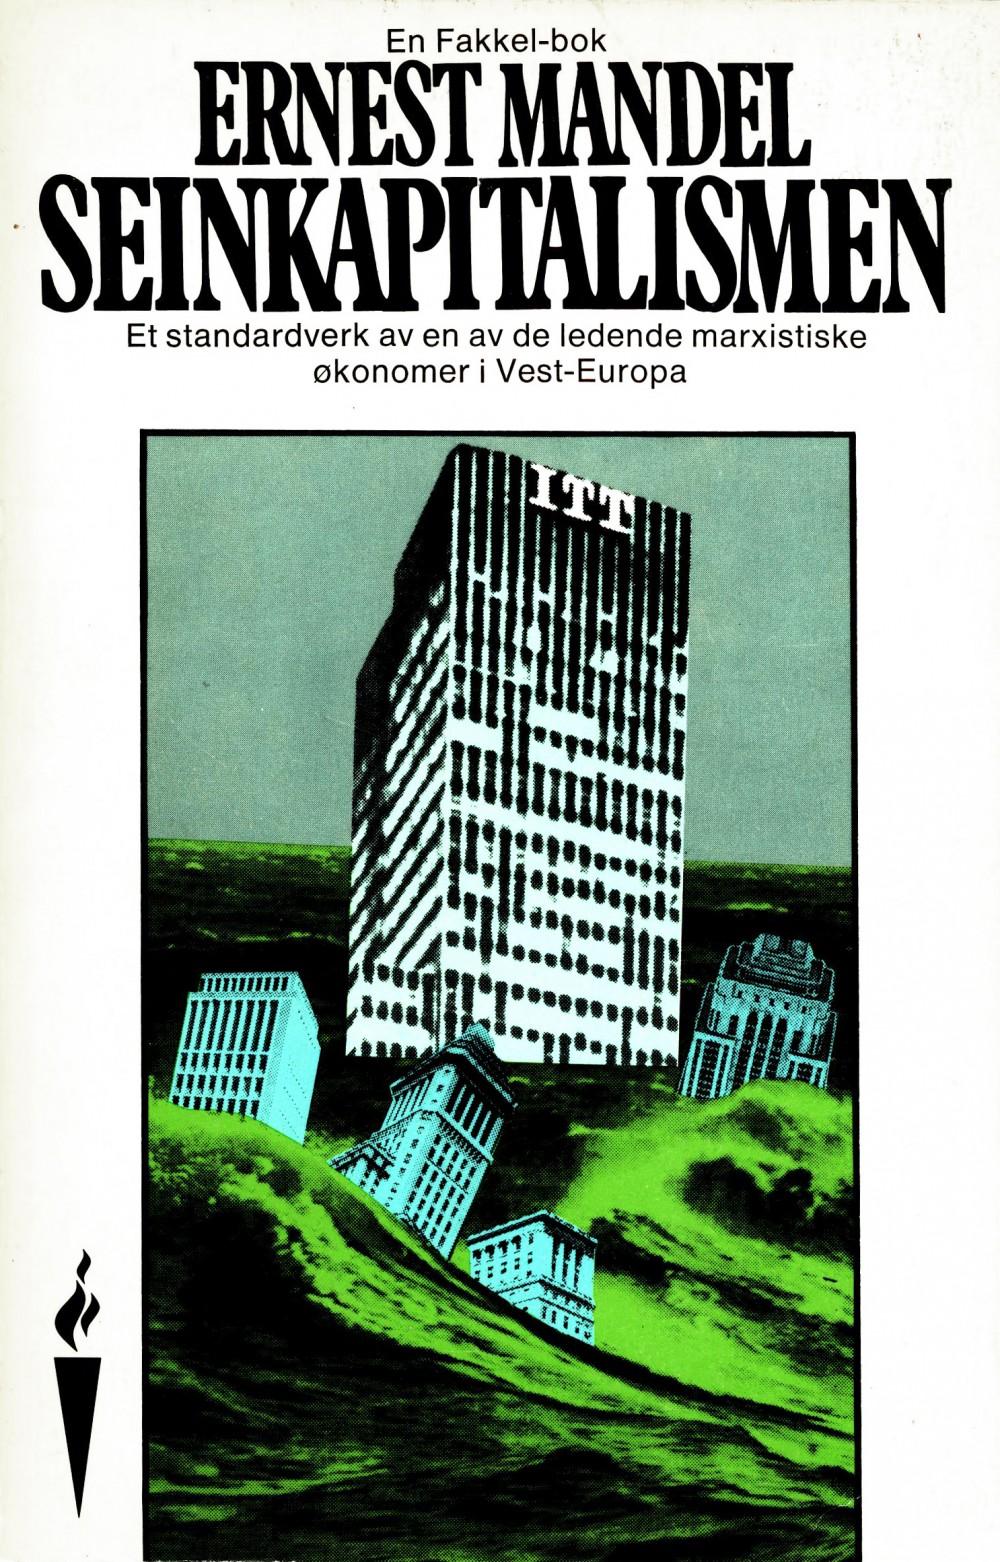 Ernest Mandel: Seinkapitalismen - Forsøk på en marxistisk forklaring